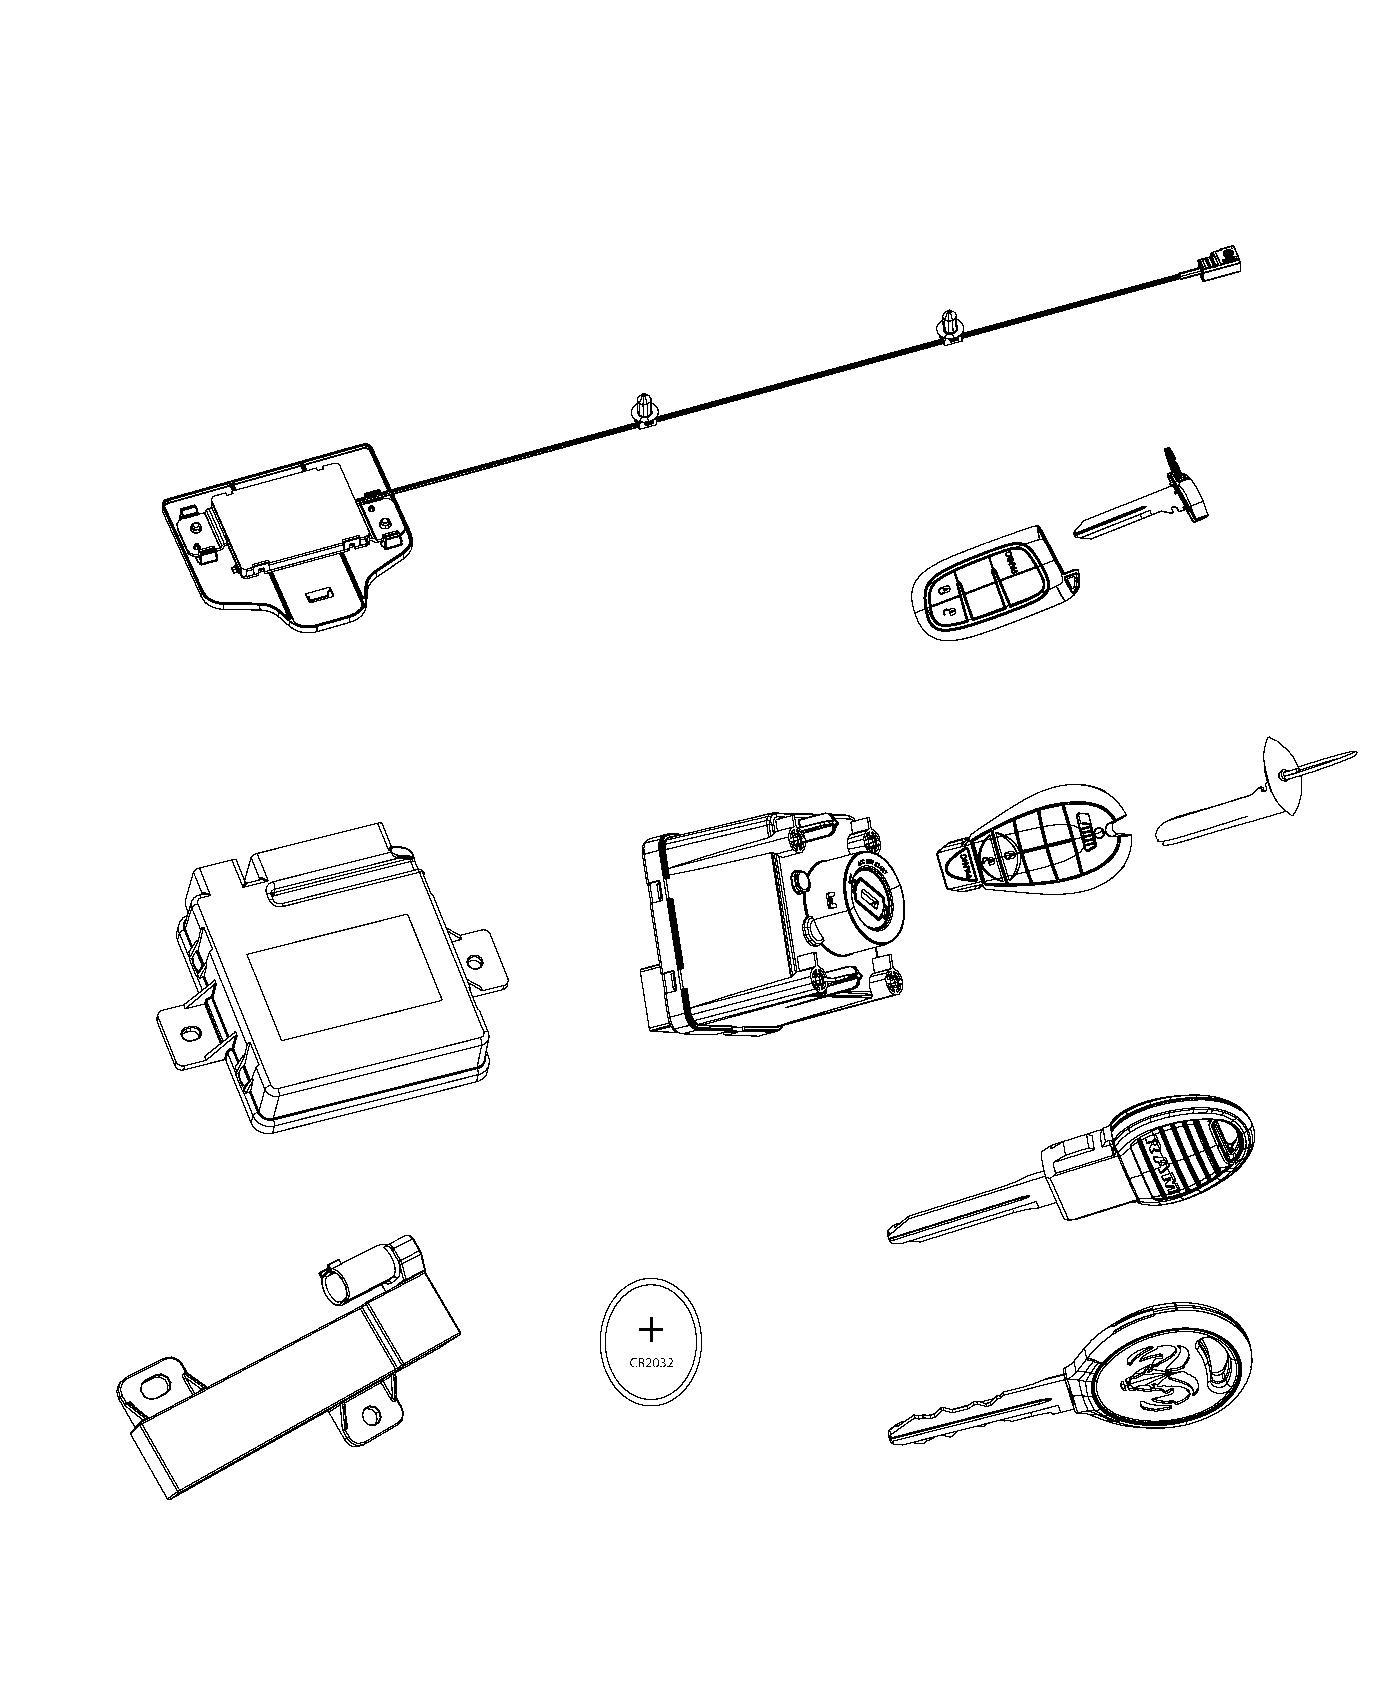 2013 Dodge Ram 1500 Receiver  Hub   Sentry Key Theft